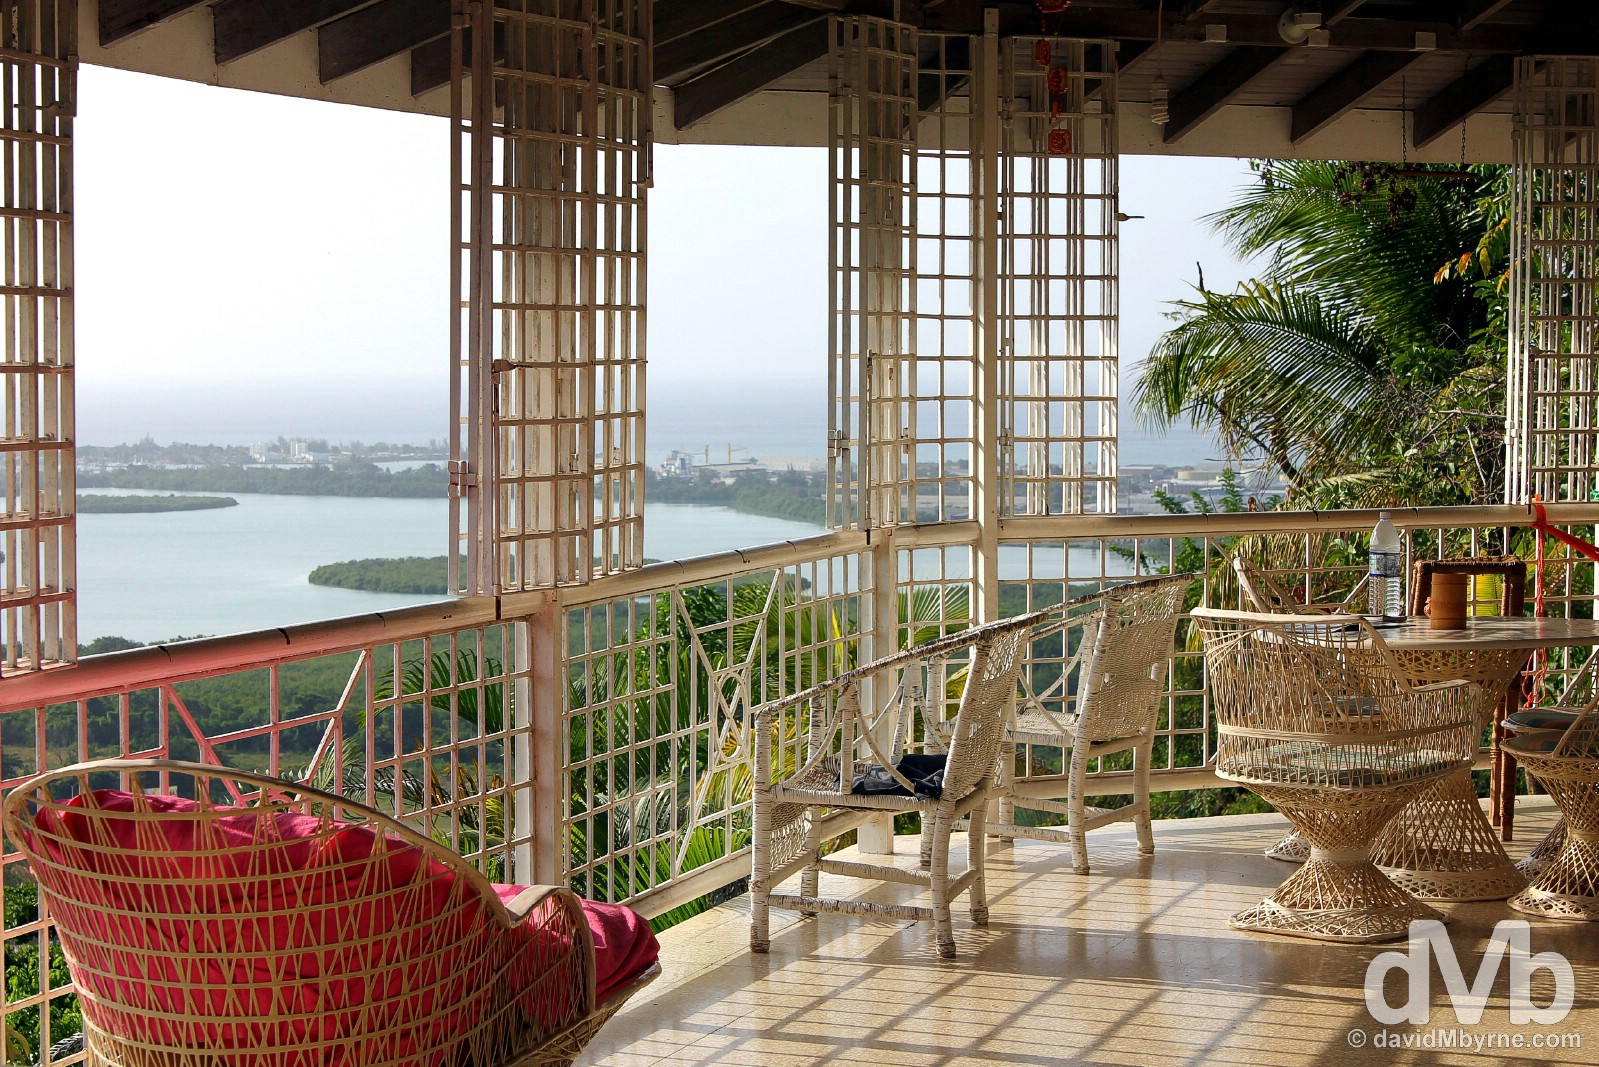 Cedar Ridge Lodge Inn, Montego Bay, Jamaica. May 14, 2015.